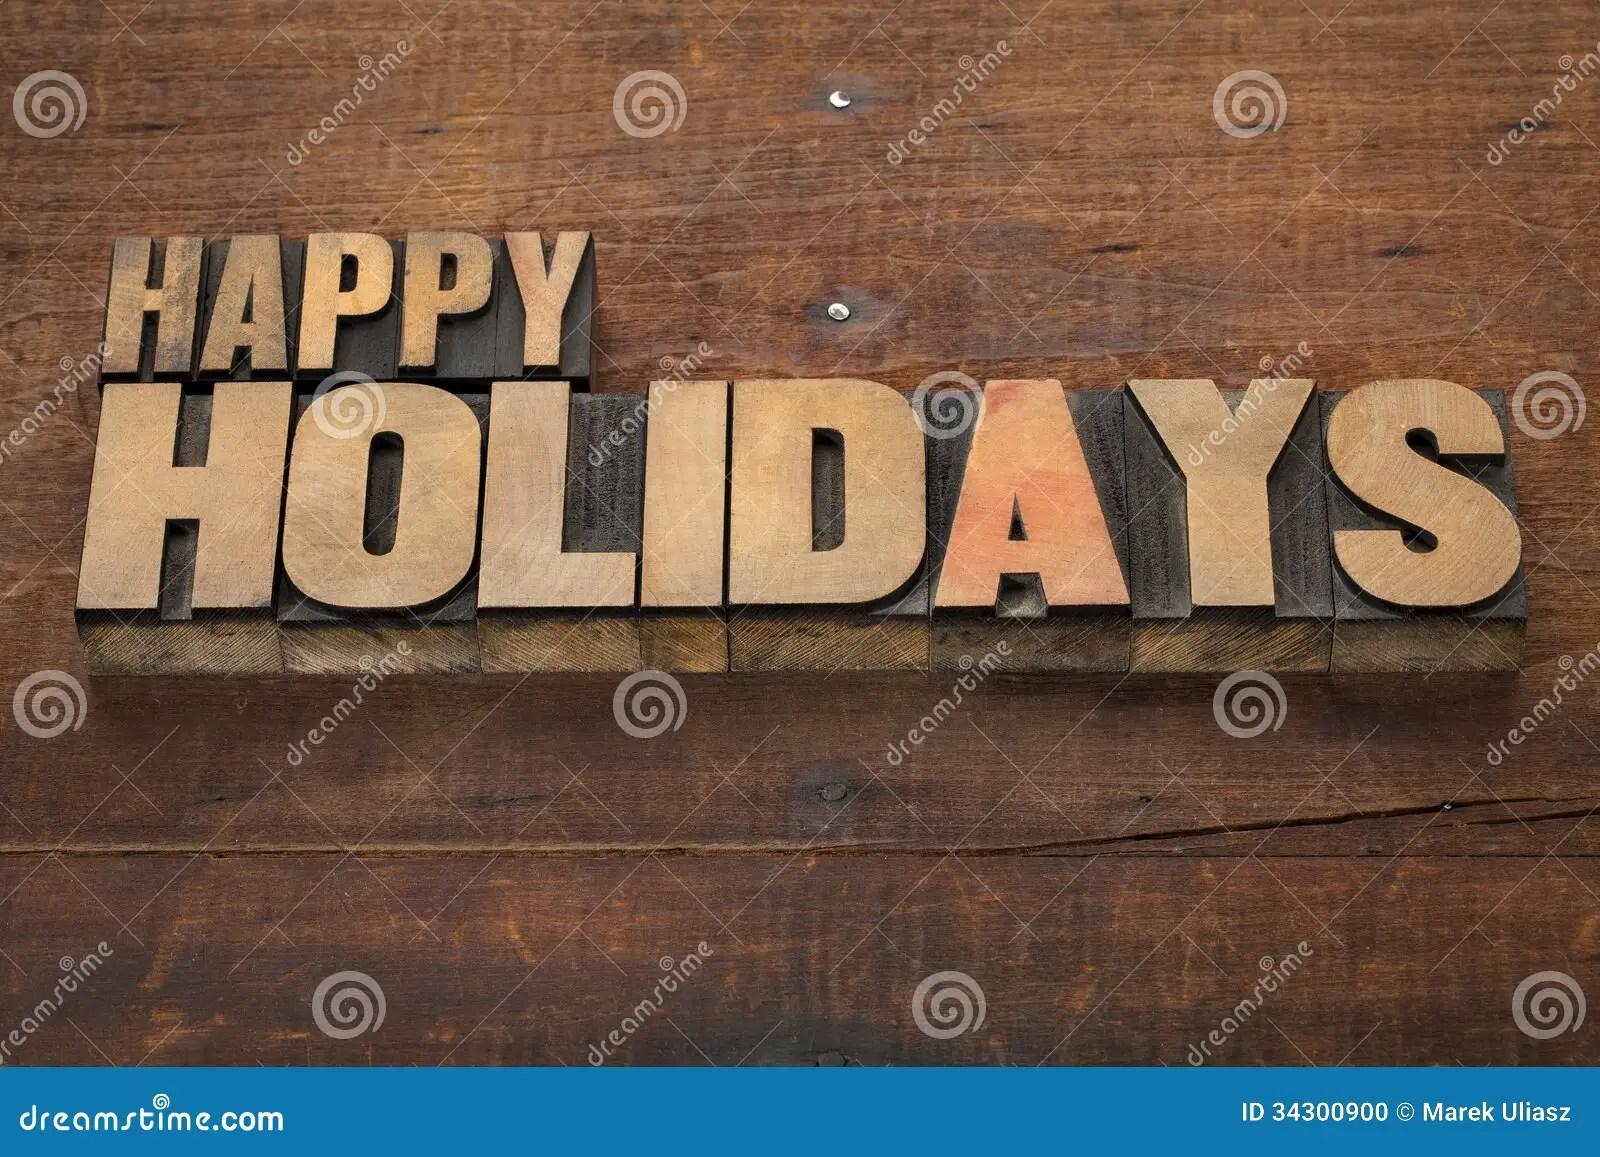 Happy Holidays In Wood Type Stock Photo Image 34300900